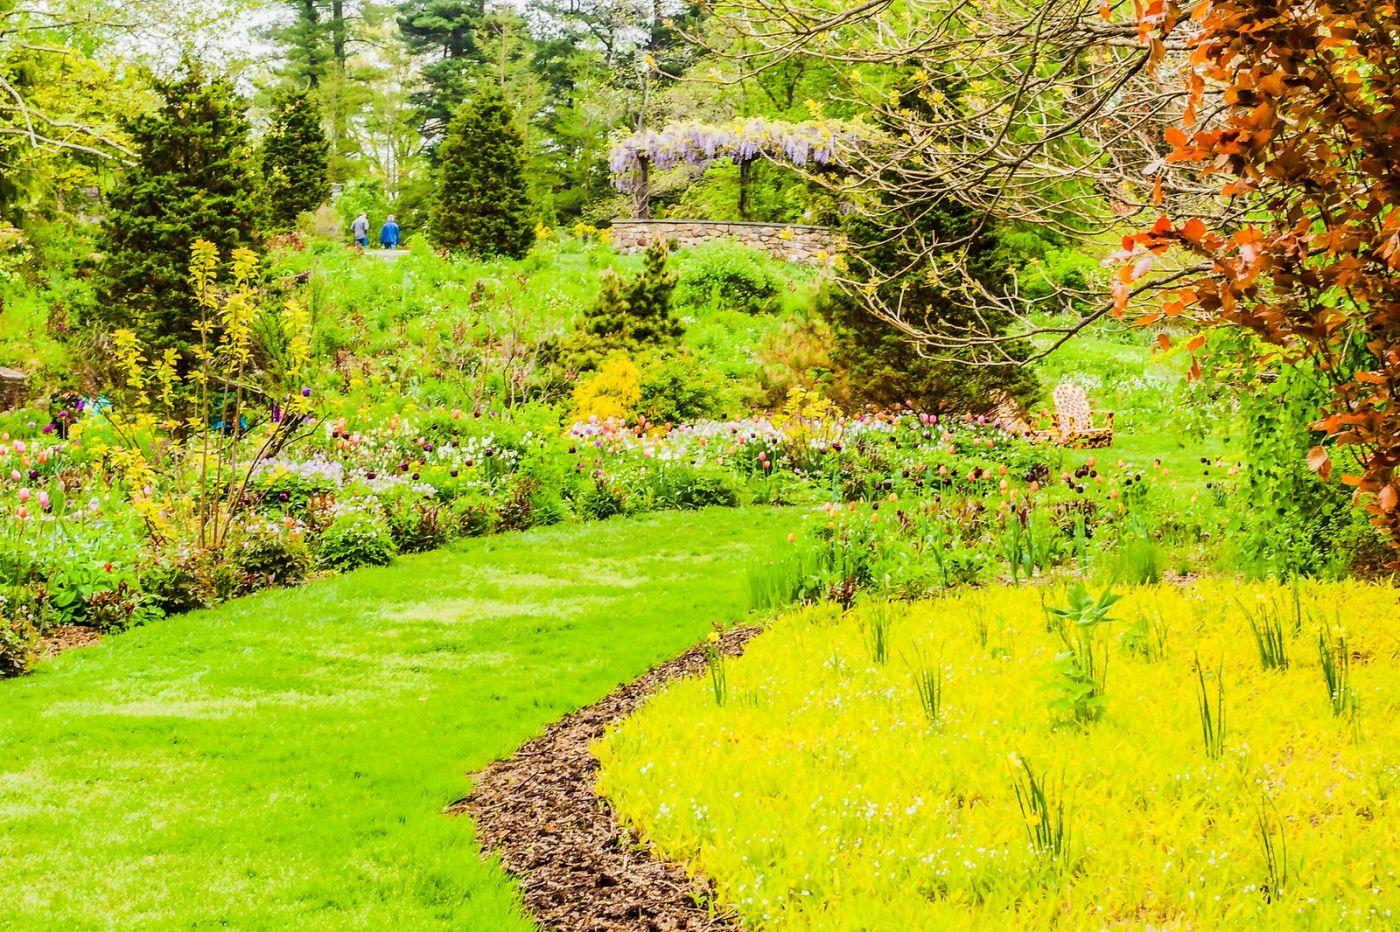 Chanticleer花园,相会在明年_图1-39